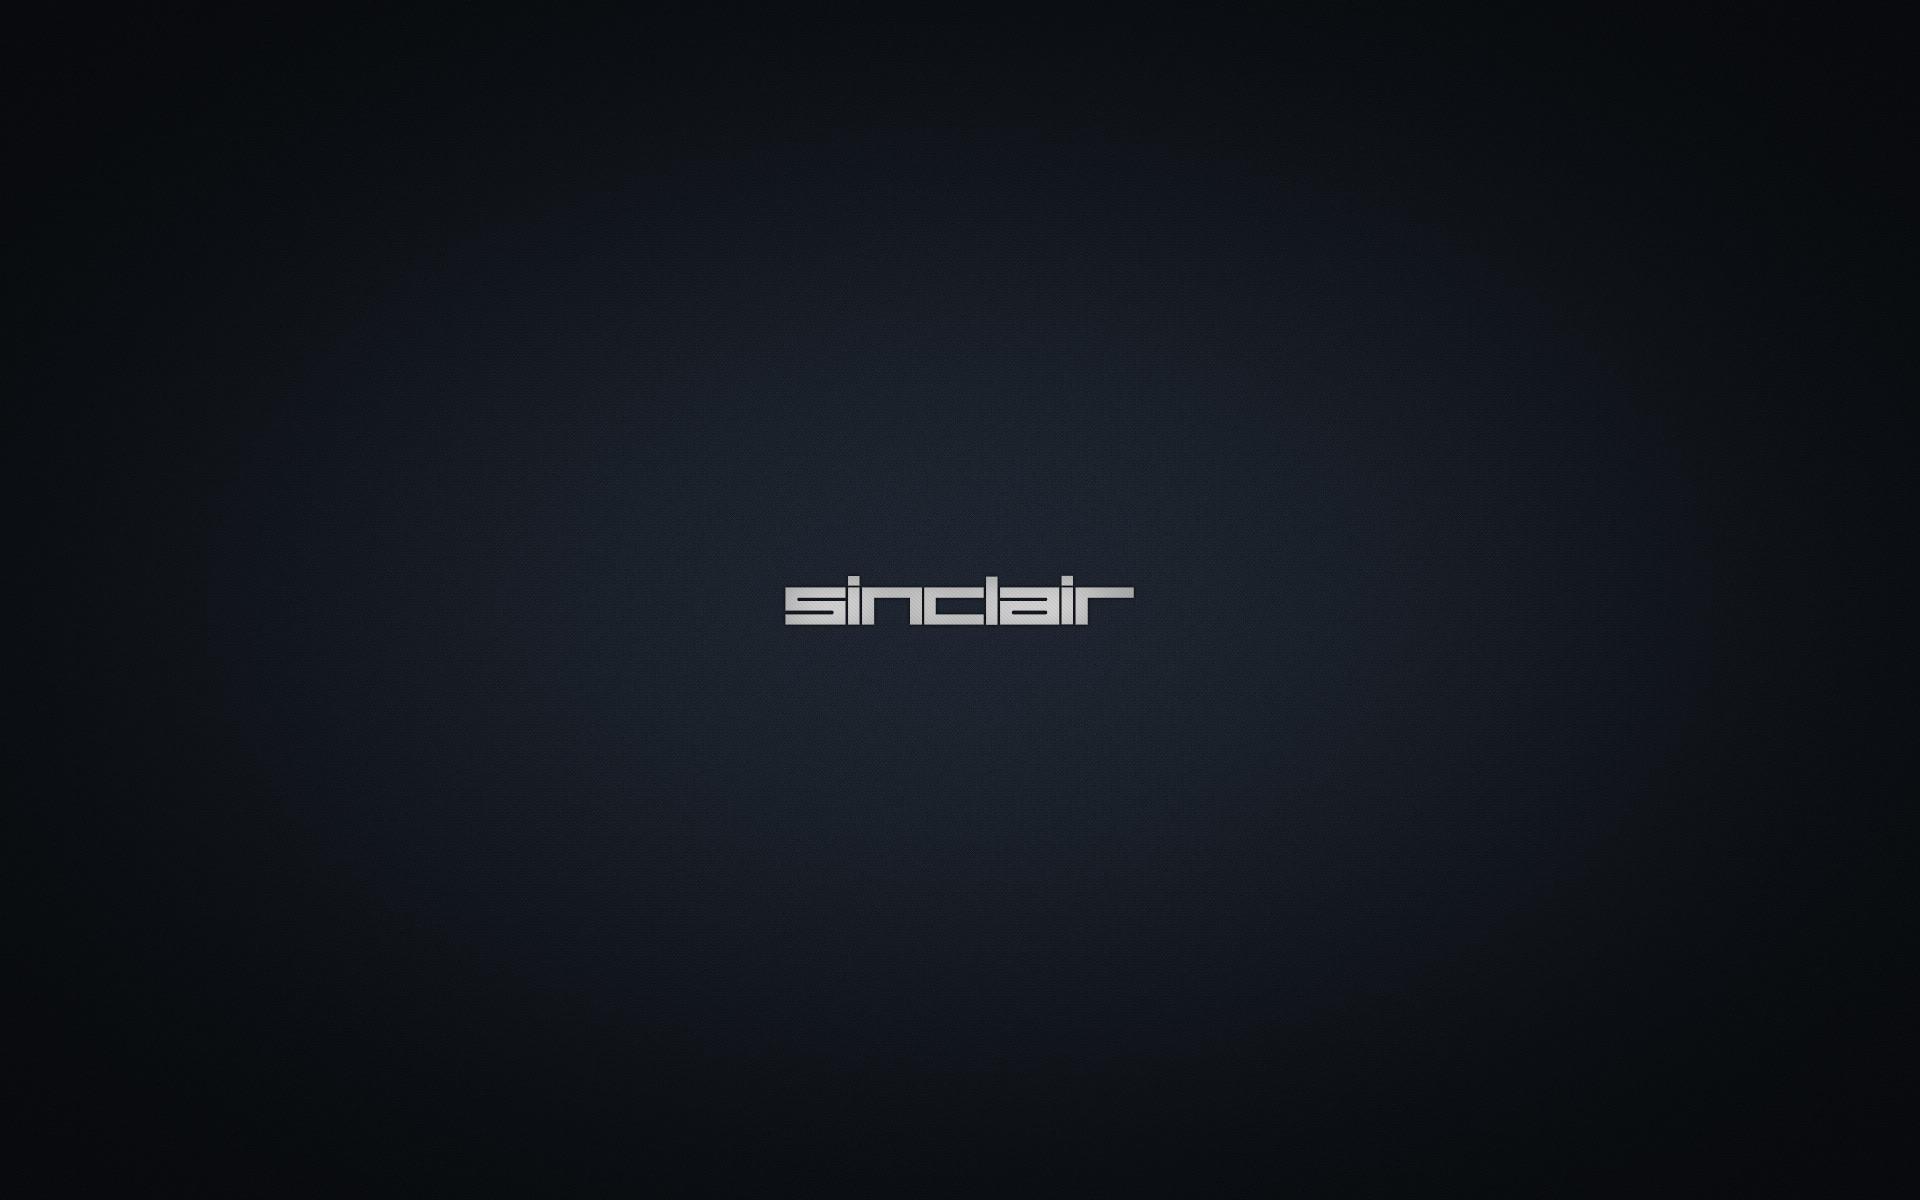 sinclair hd wallpaper dark blue by pixeloza customization wallpaper .